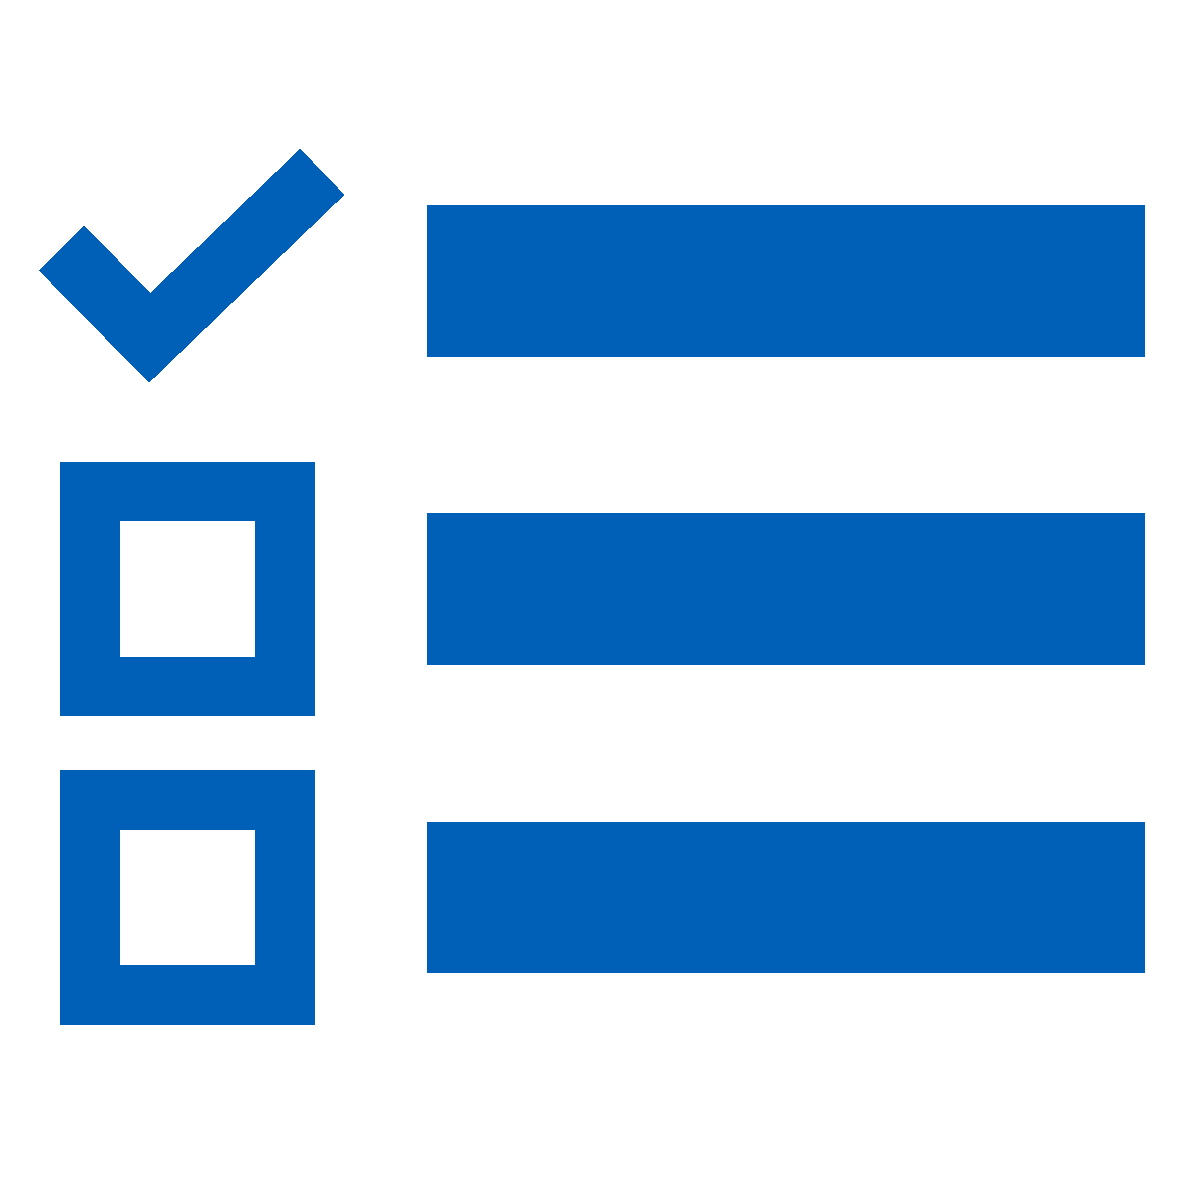 Disaster Risk Management Blue RGB - Sectores de intervención